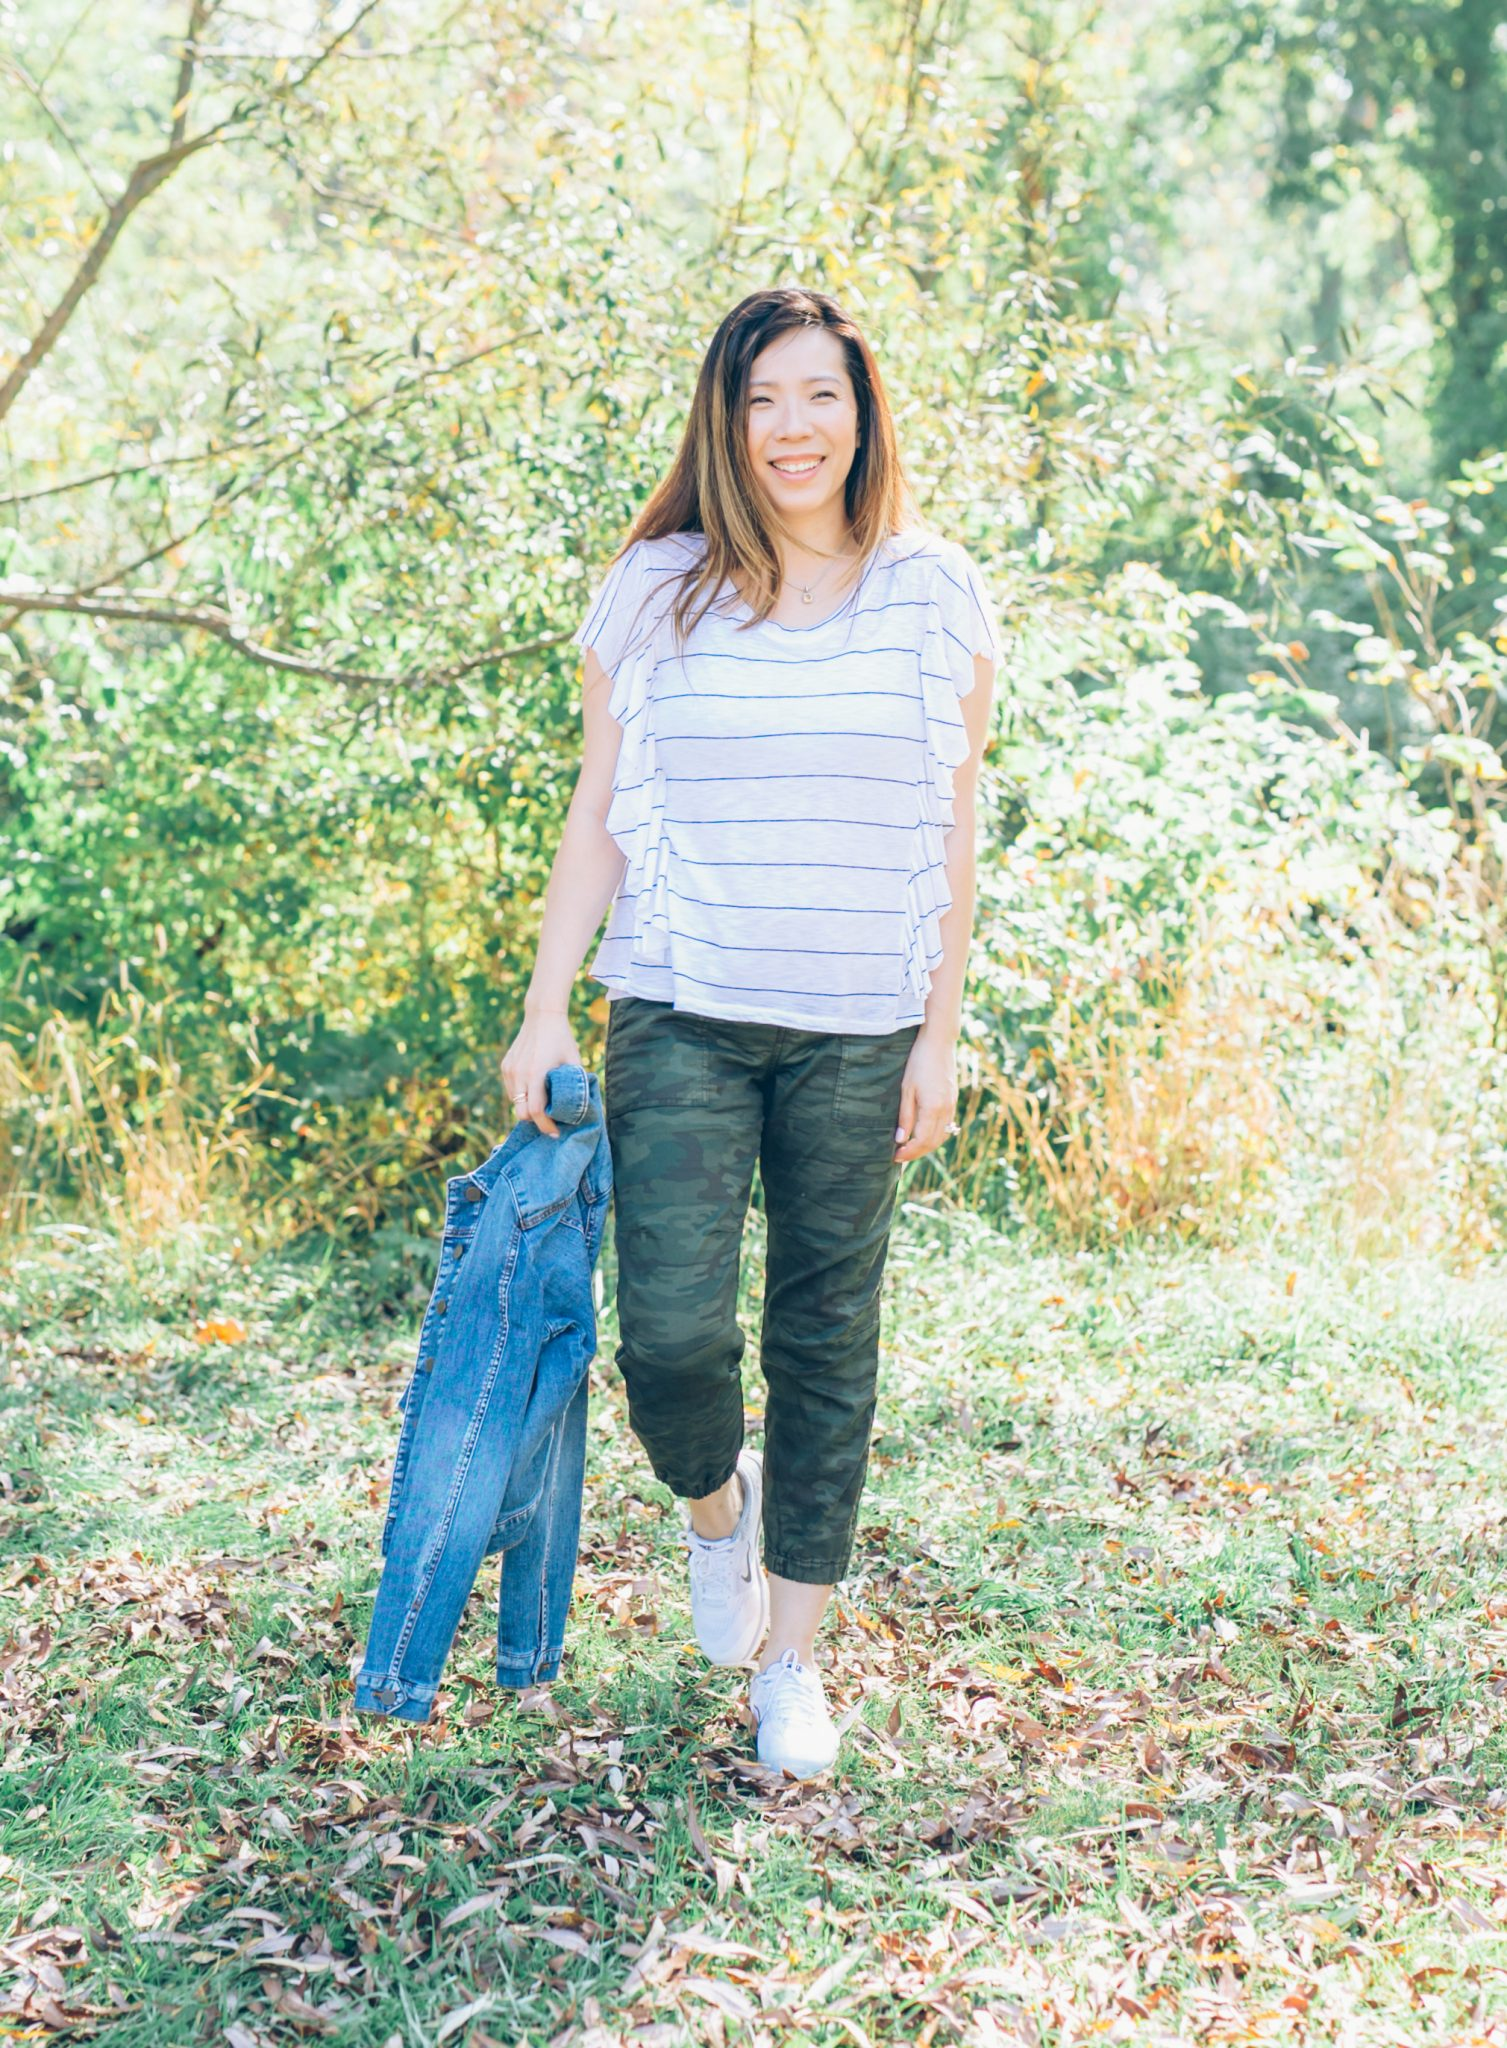 how to be a fashionable mom, fashion mom, mom fashion, mom style, comfortable style, simple style